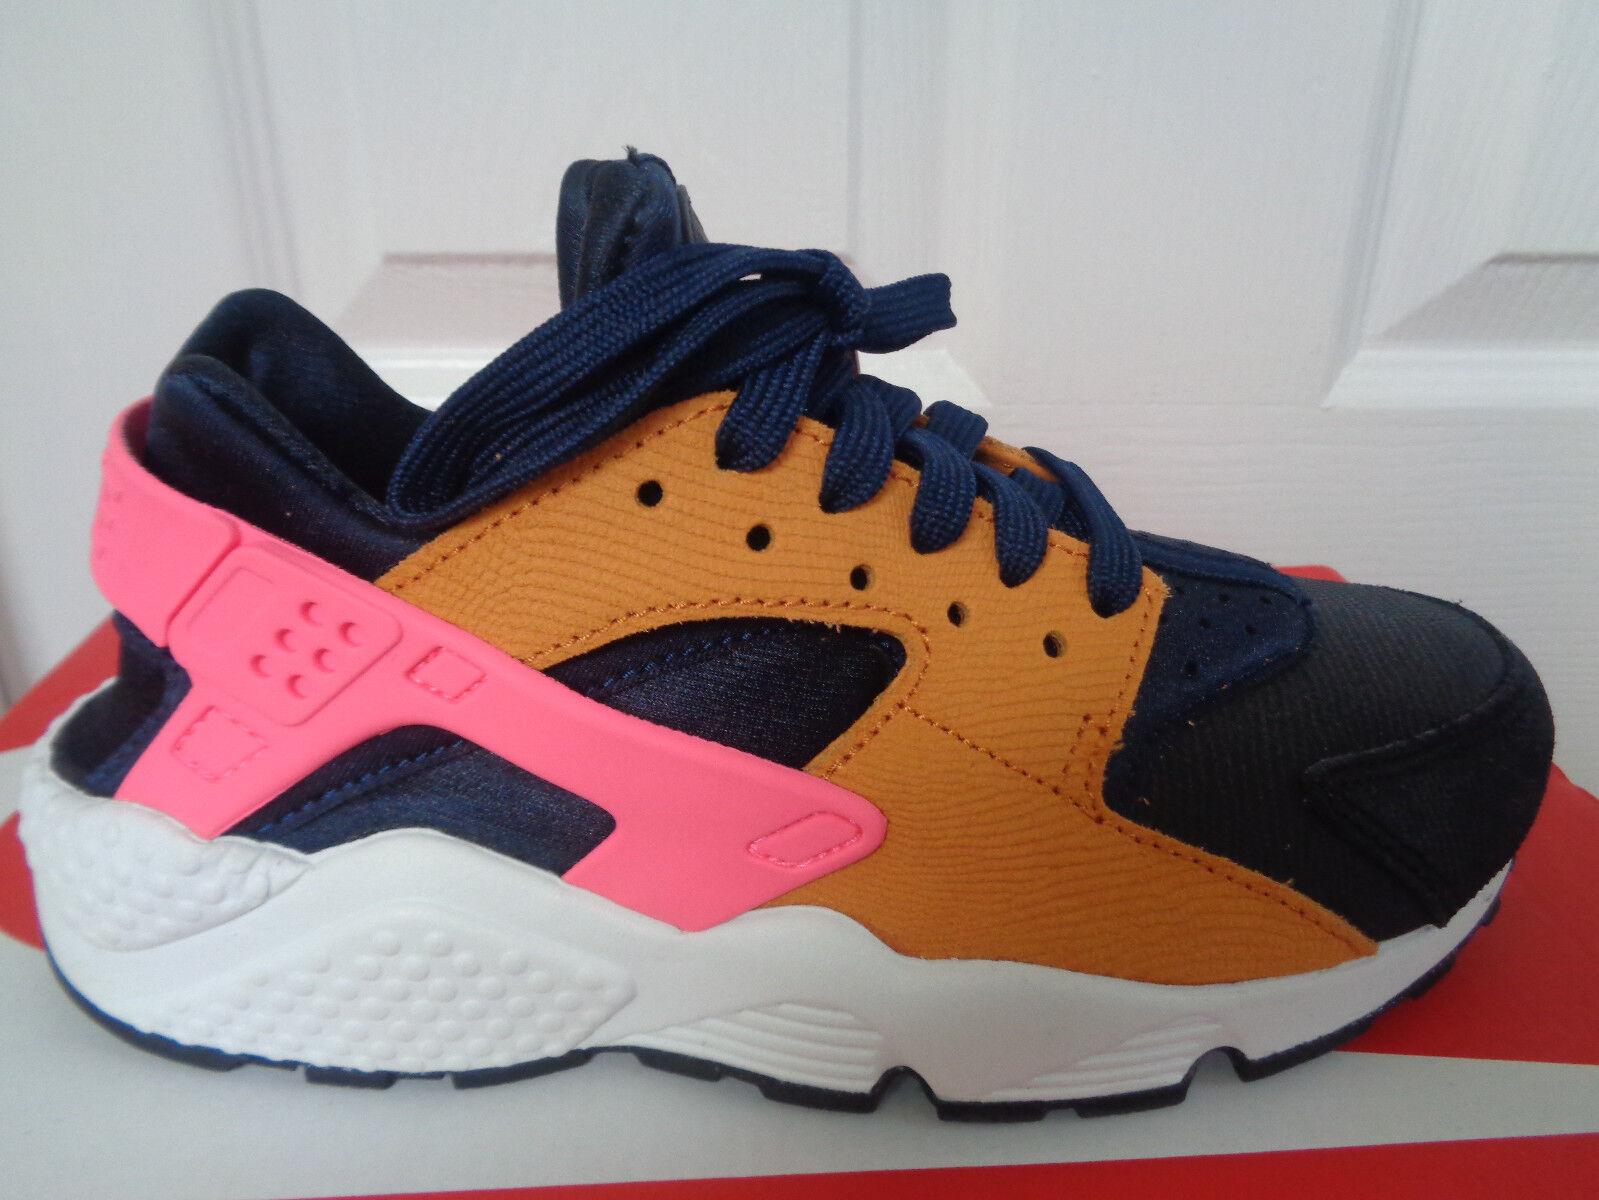 Nike air huarache corsa ridotta ridotta ridotta donne formatori 683818 401 ue 37,5 noi 6,5 nuovi   box | A Prezzo Ridotto  83c0b3